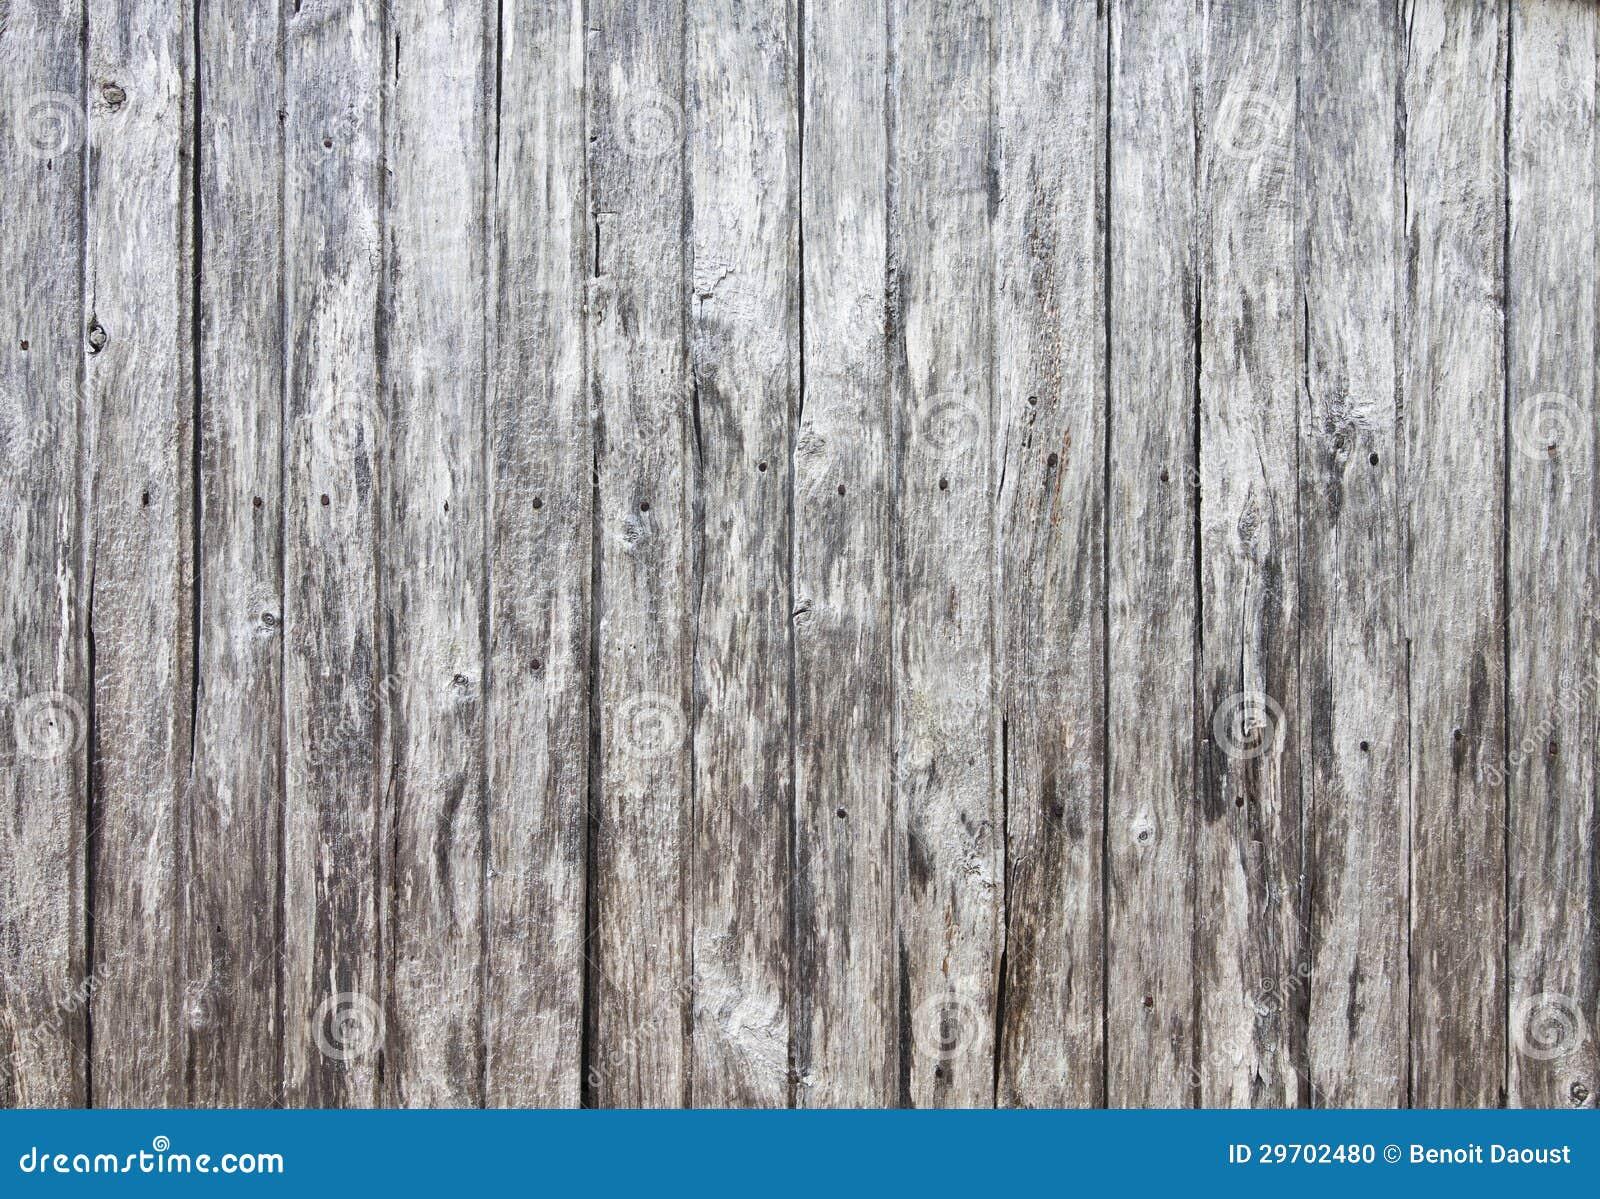 Old Barn Wood Texture Stock Photo Image 29702480